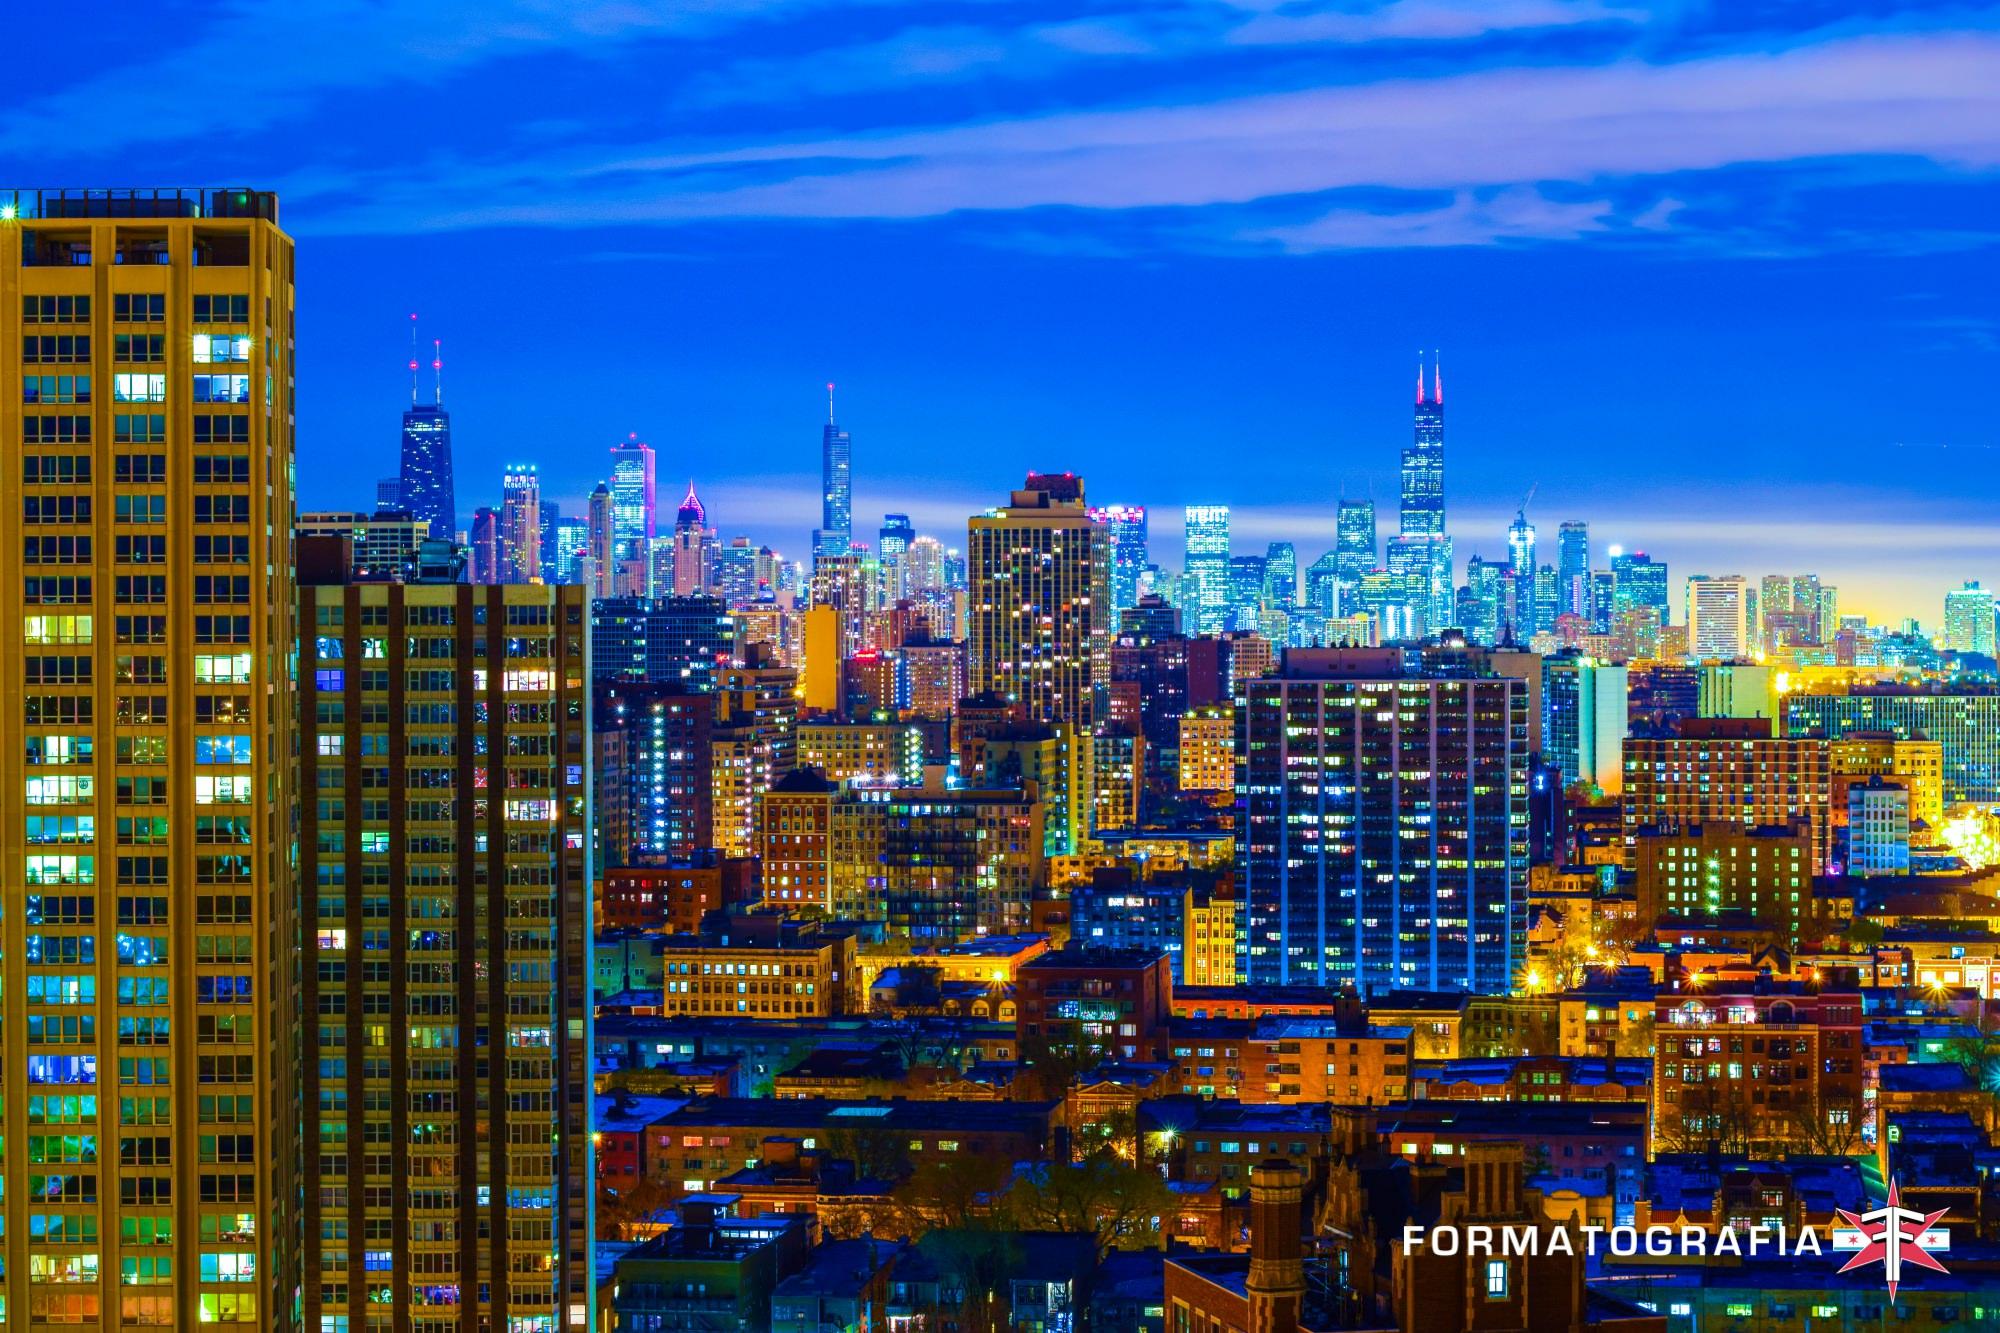 eric formato chicago photographer fall update city architecture shotsDSC_0756.jpg